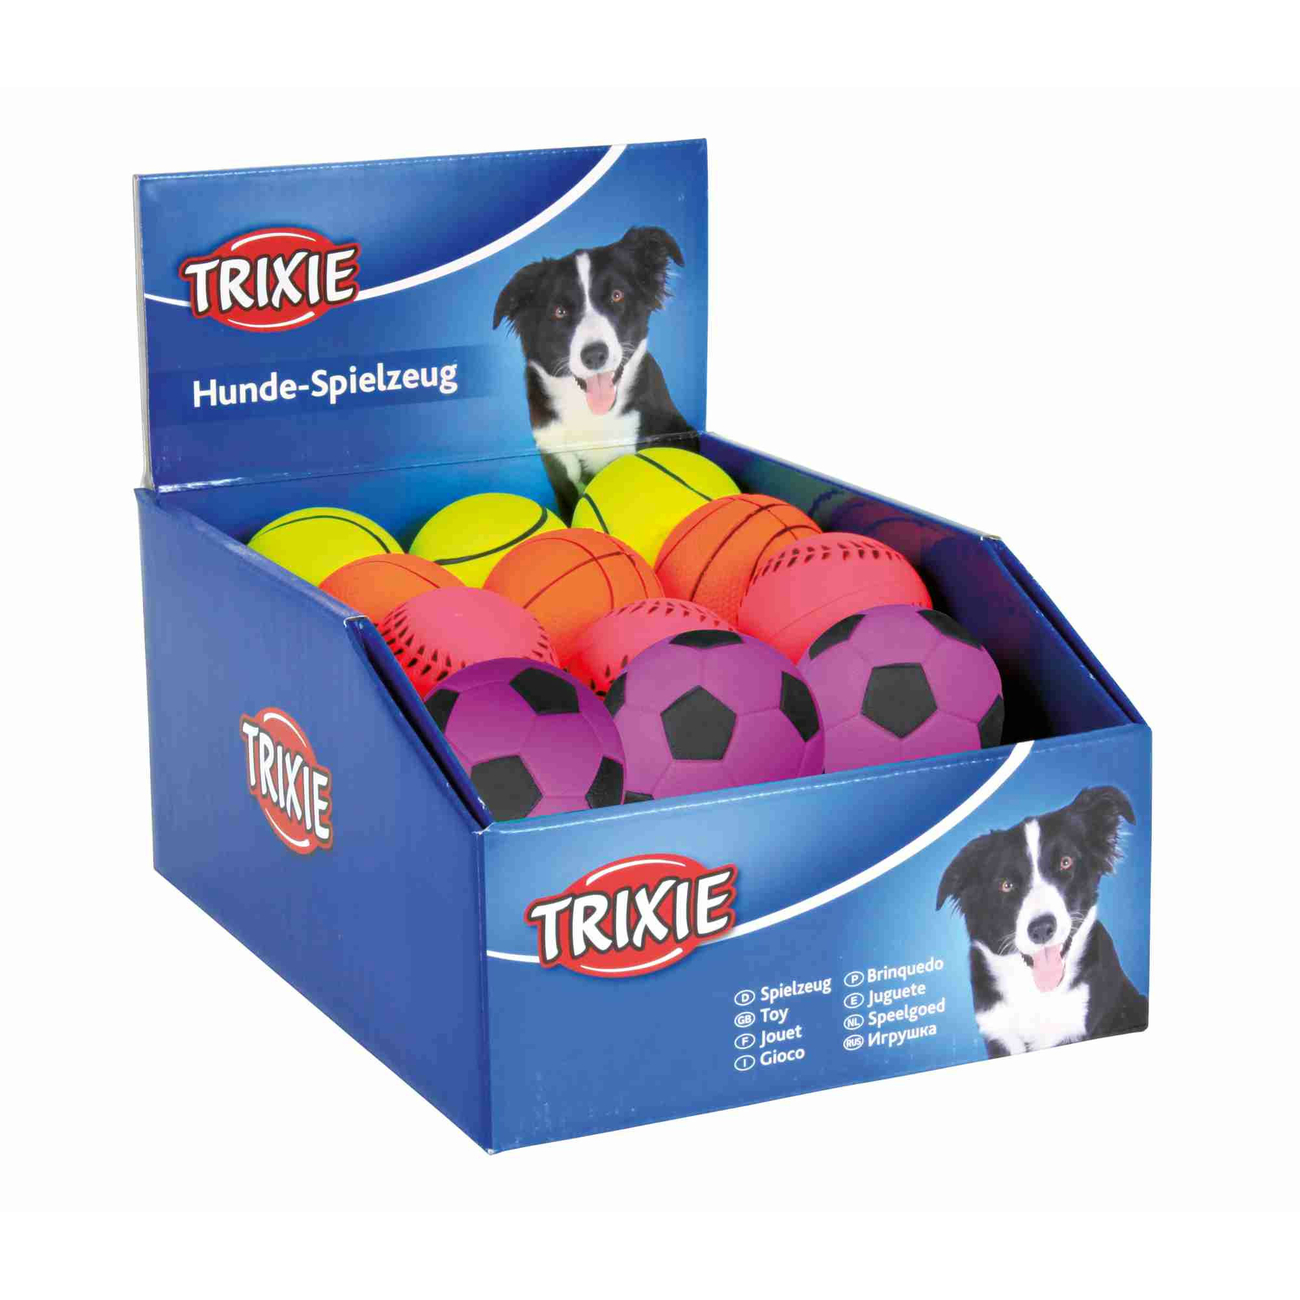 TRIXIE Hundeball Spielball aus Moosgummi 6 cm 3443, Bild 4